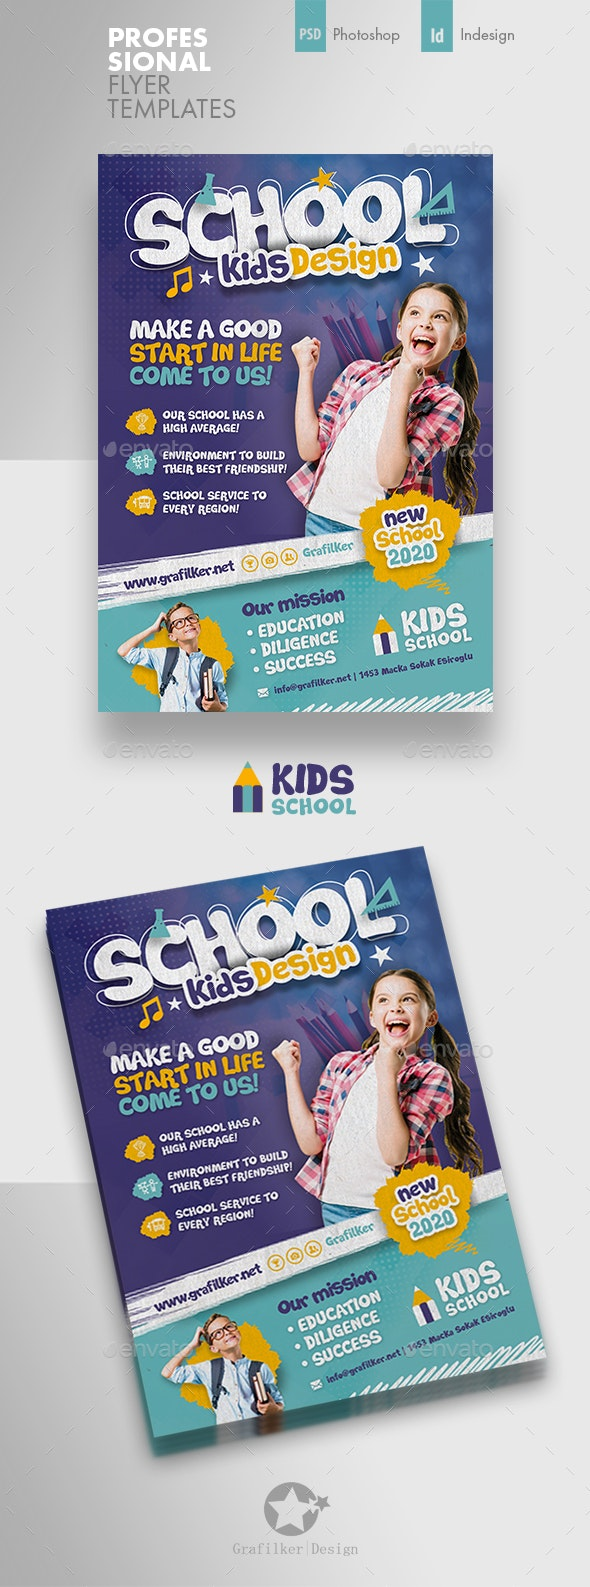 Kids School Flyer Templates - Corporate Flyers